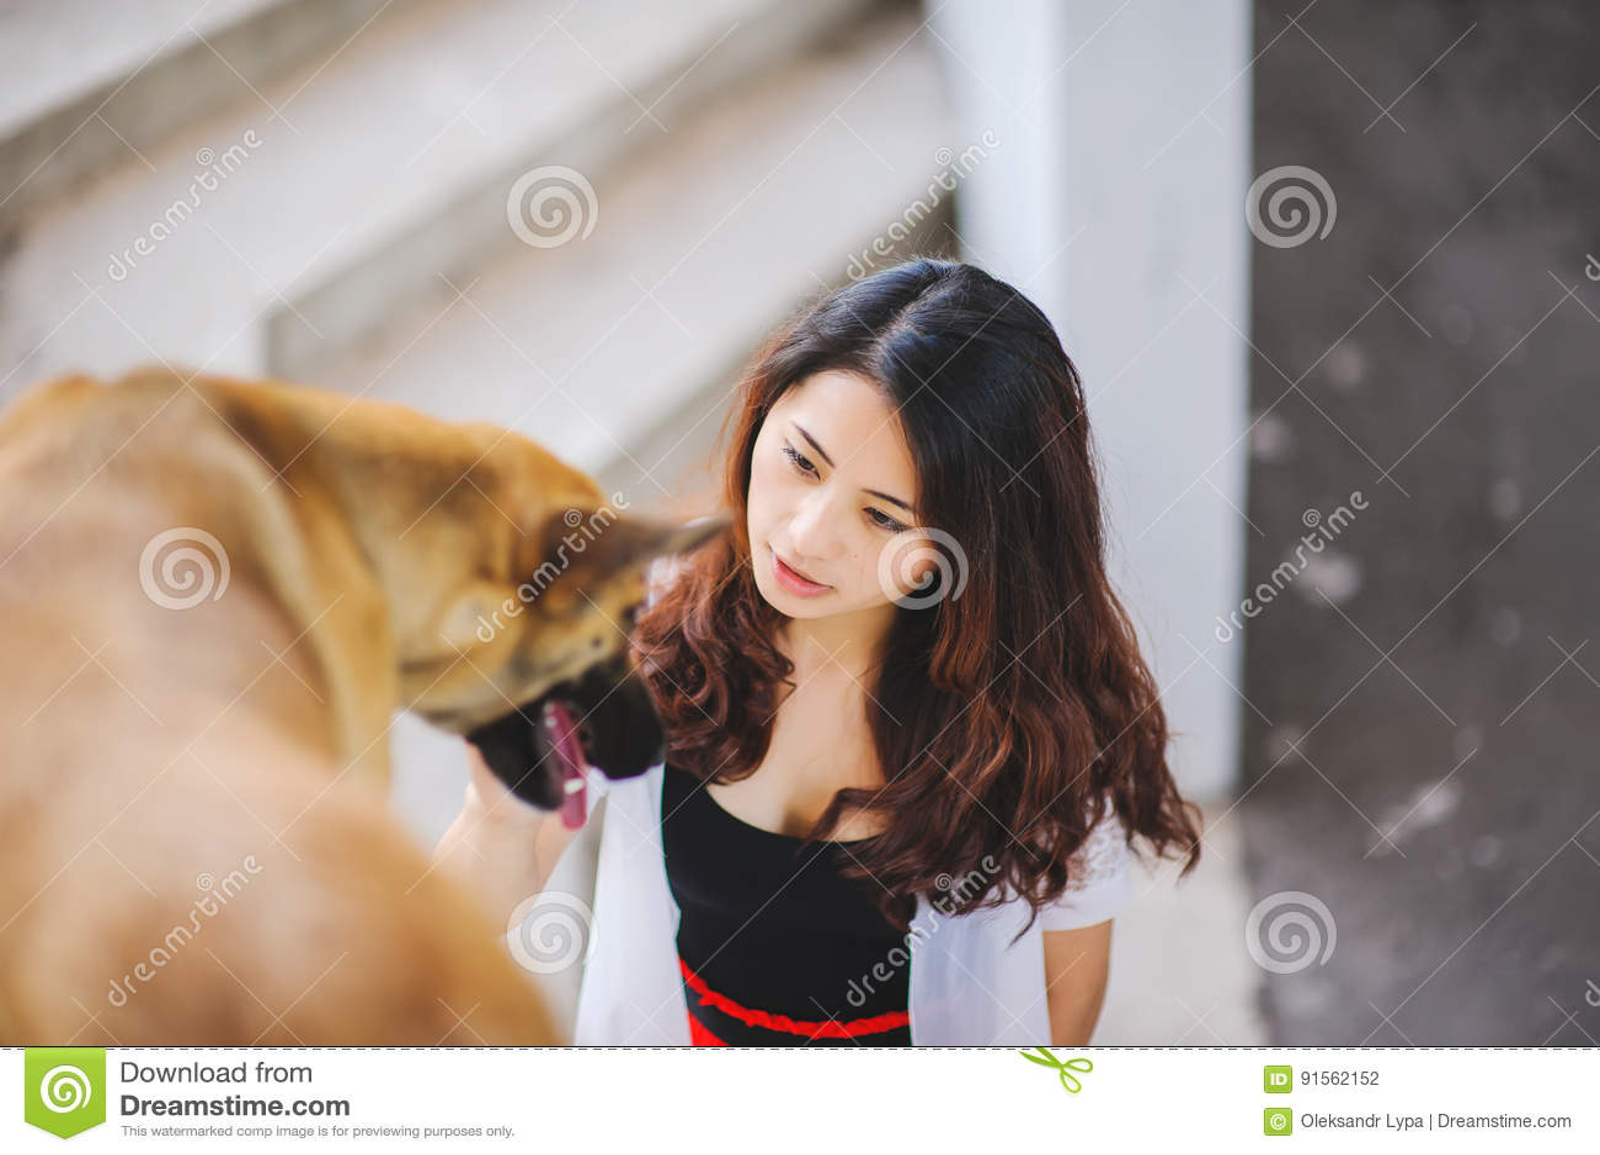 girls Asian pet